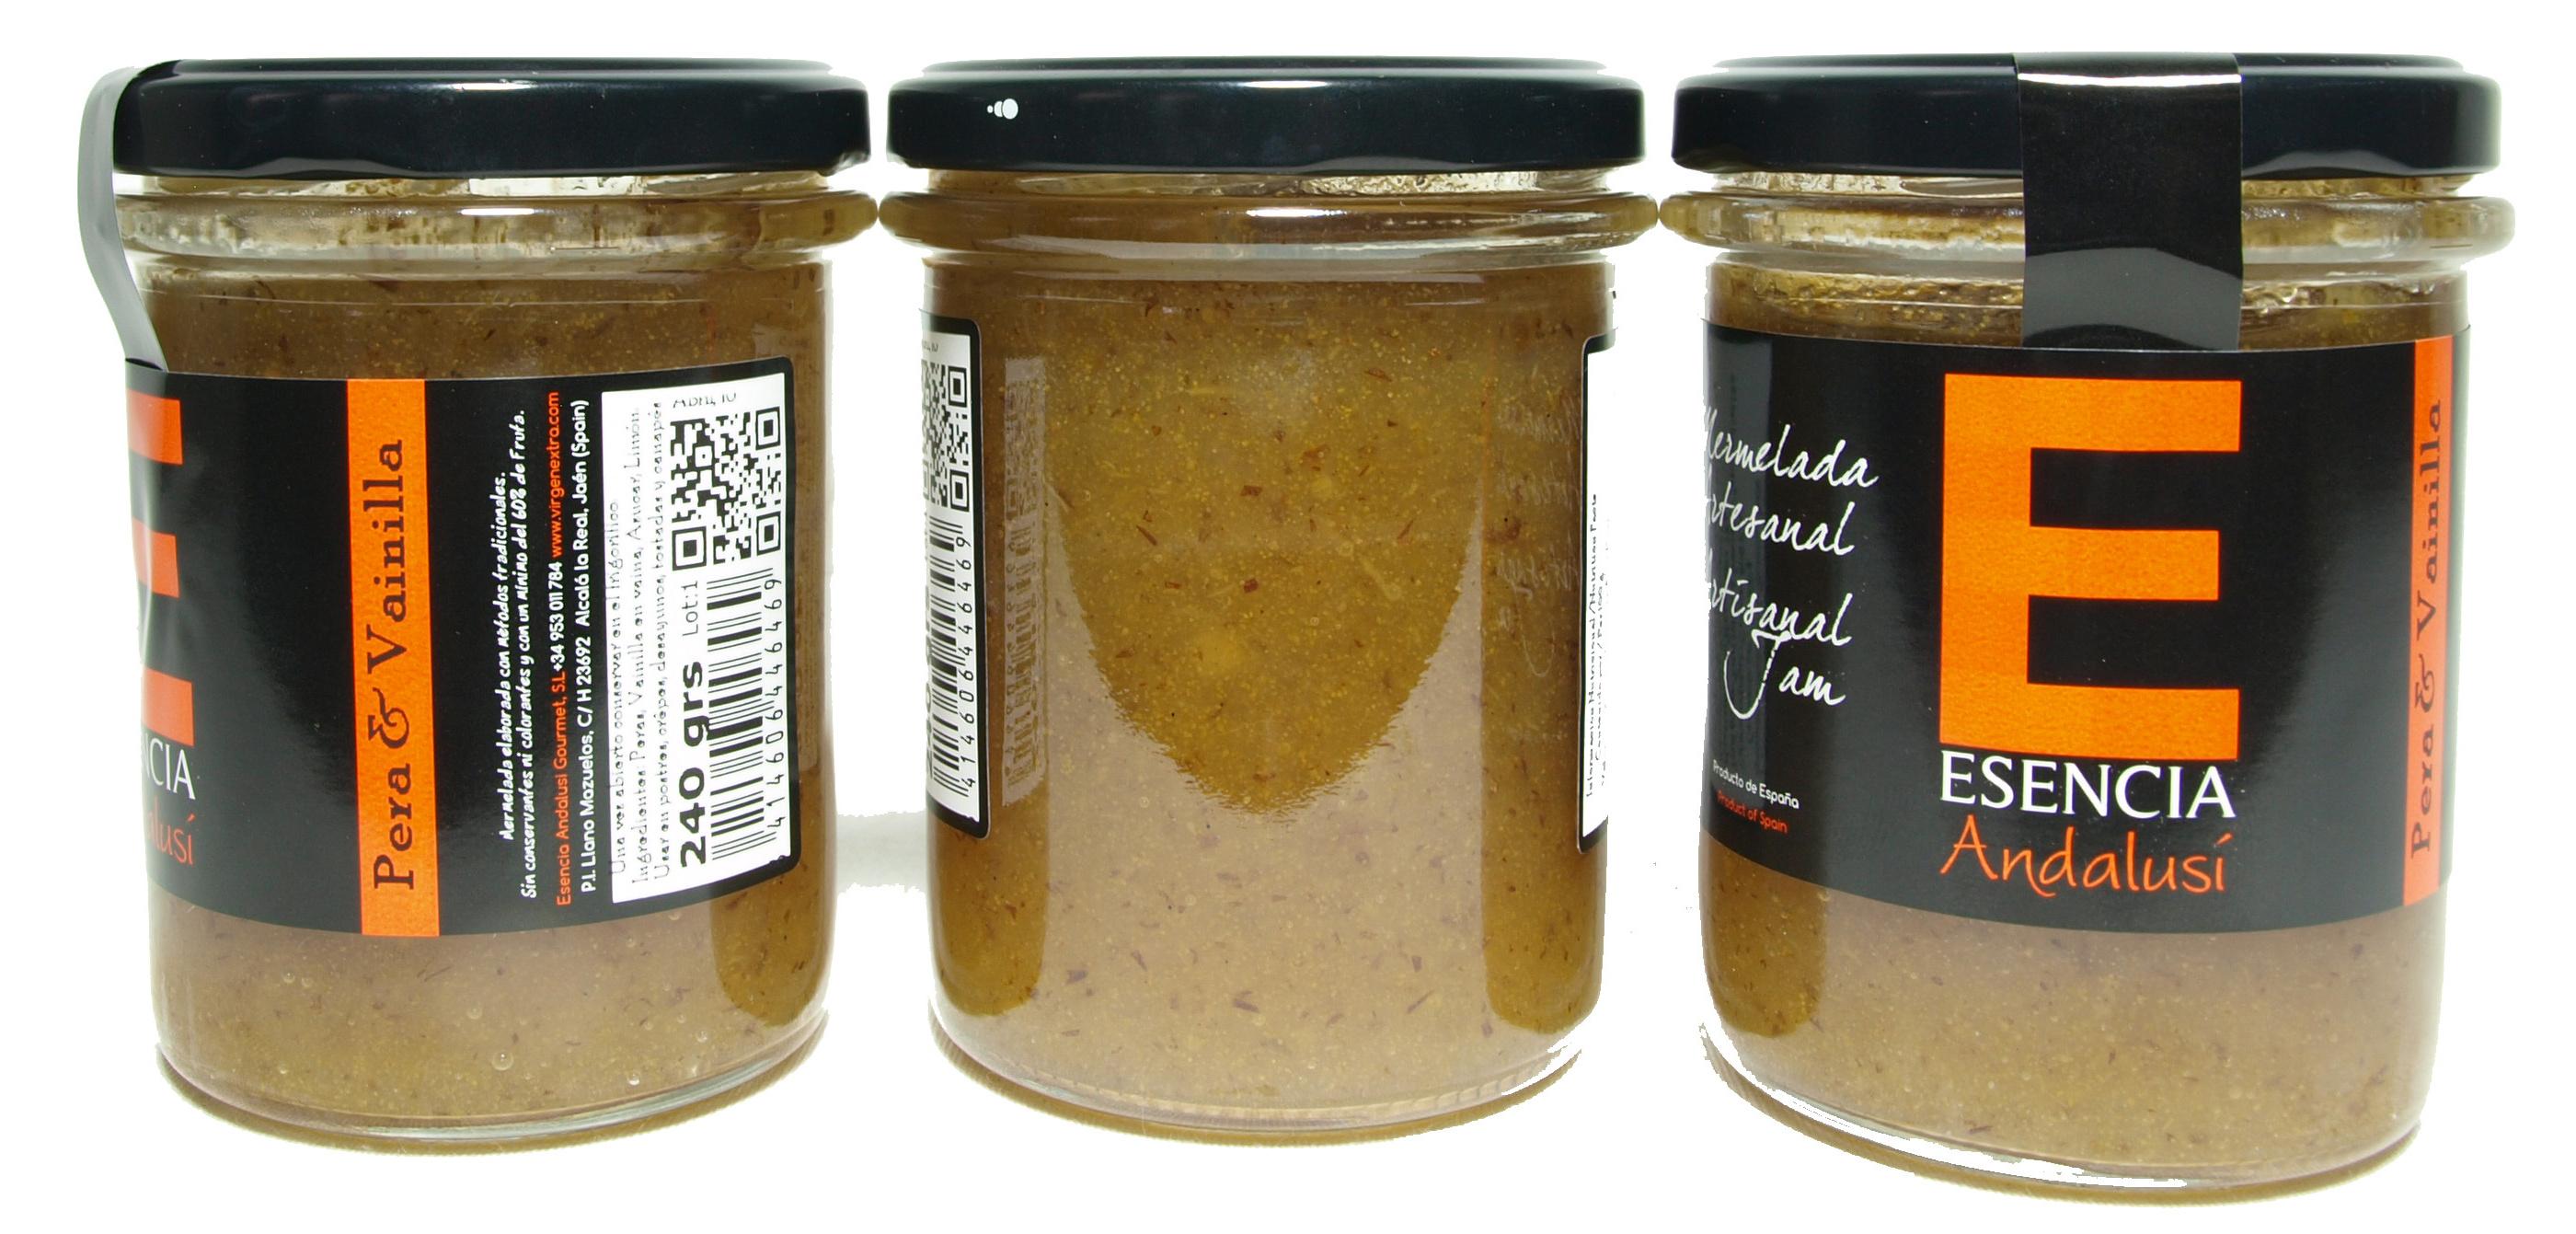 Mermelada de pera & vainilla - Product